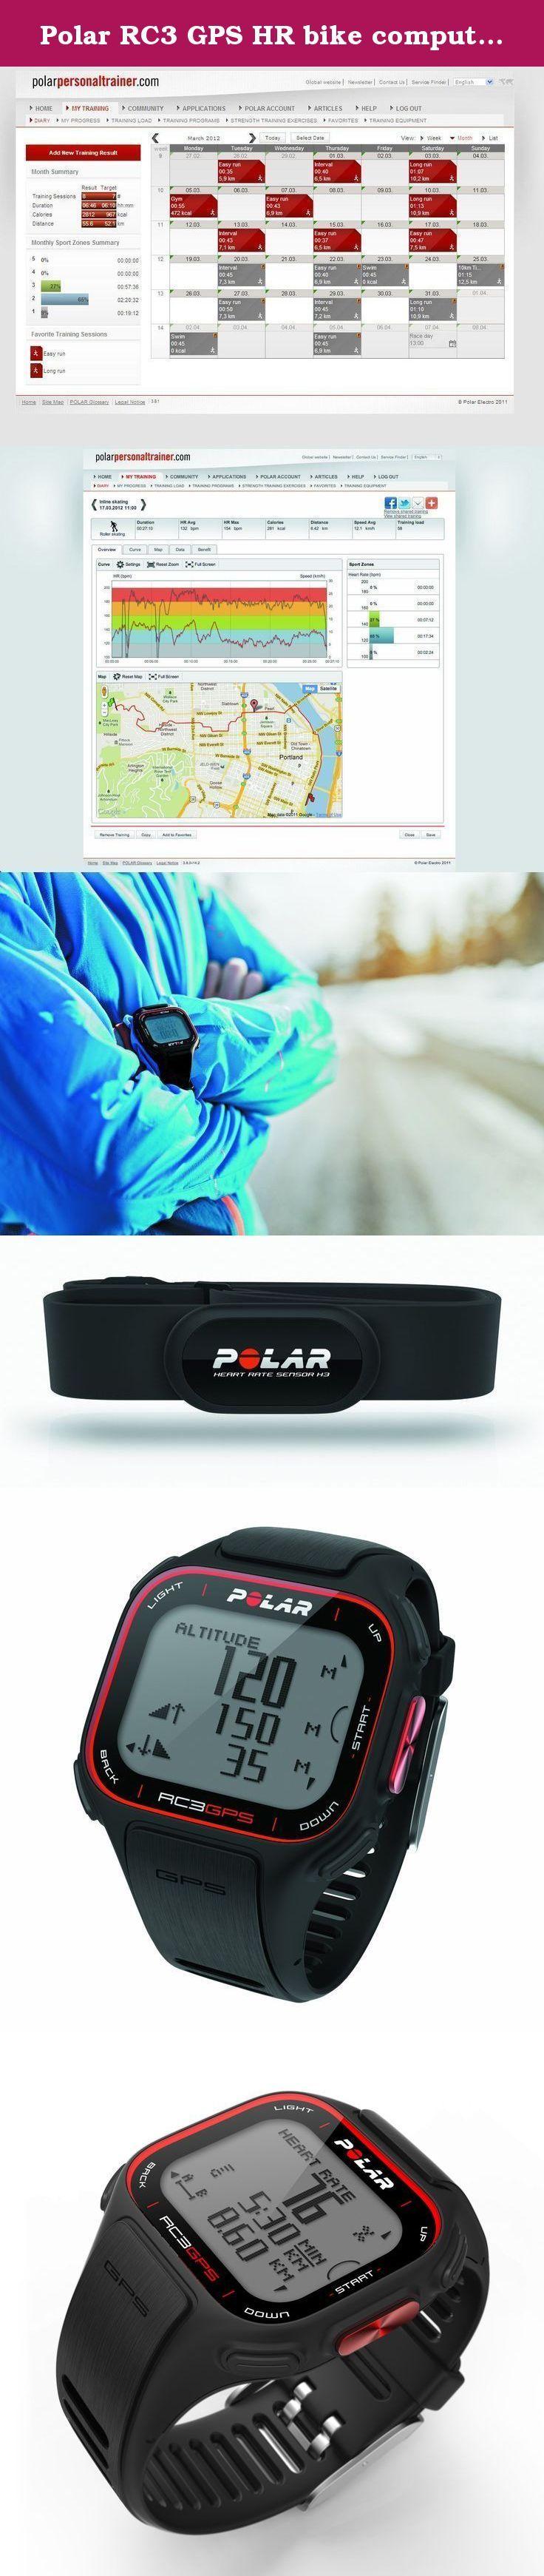 Polar RC3 GPS HR bike computer wireless mit Herzfrequenz-Sensor black. - Brand: Polar Clock - Gender: Unisex - rubber strap, black color - black box colored polycarbonate - black Dial Color - Machinery: Quartz - Functions: Digital - Waterproof: 50 mtrs - Box Dimensions: 44 X mlm 40 mlm - Incl.